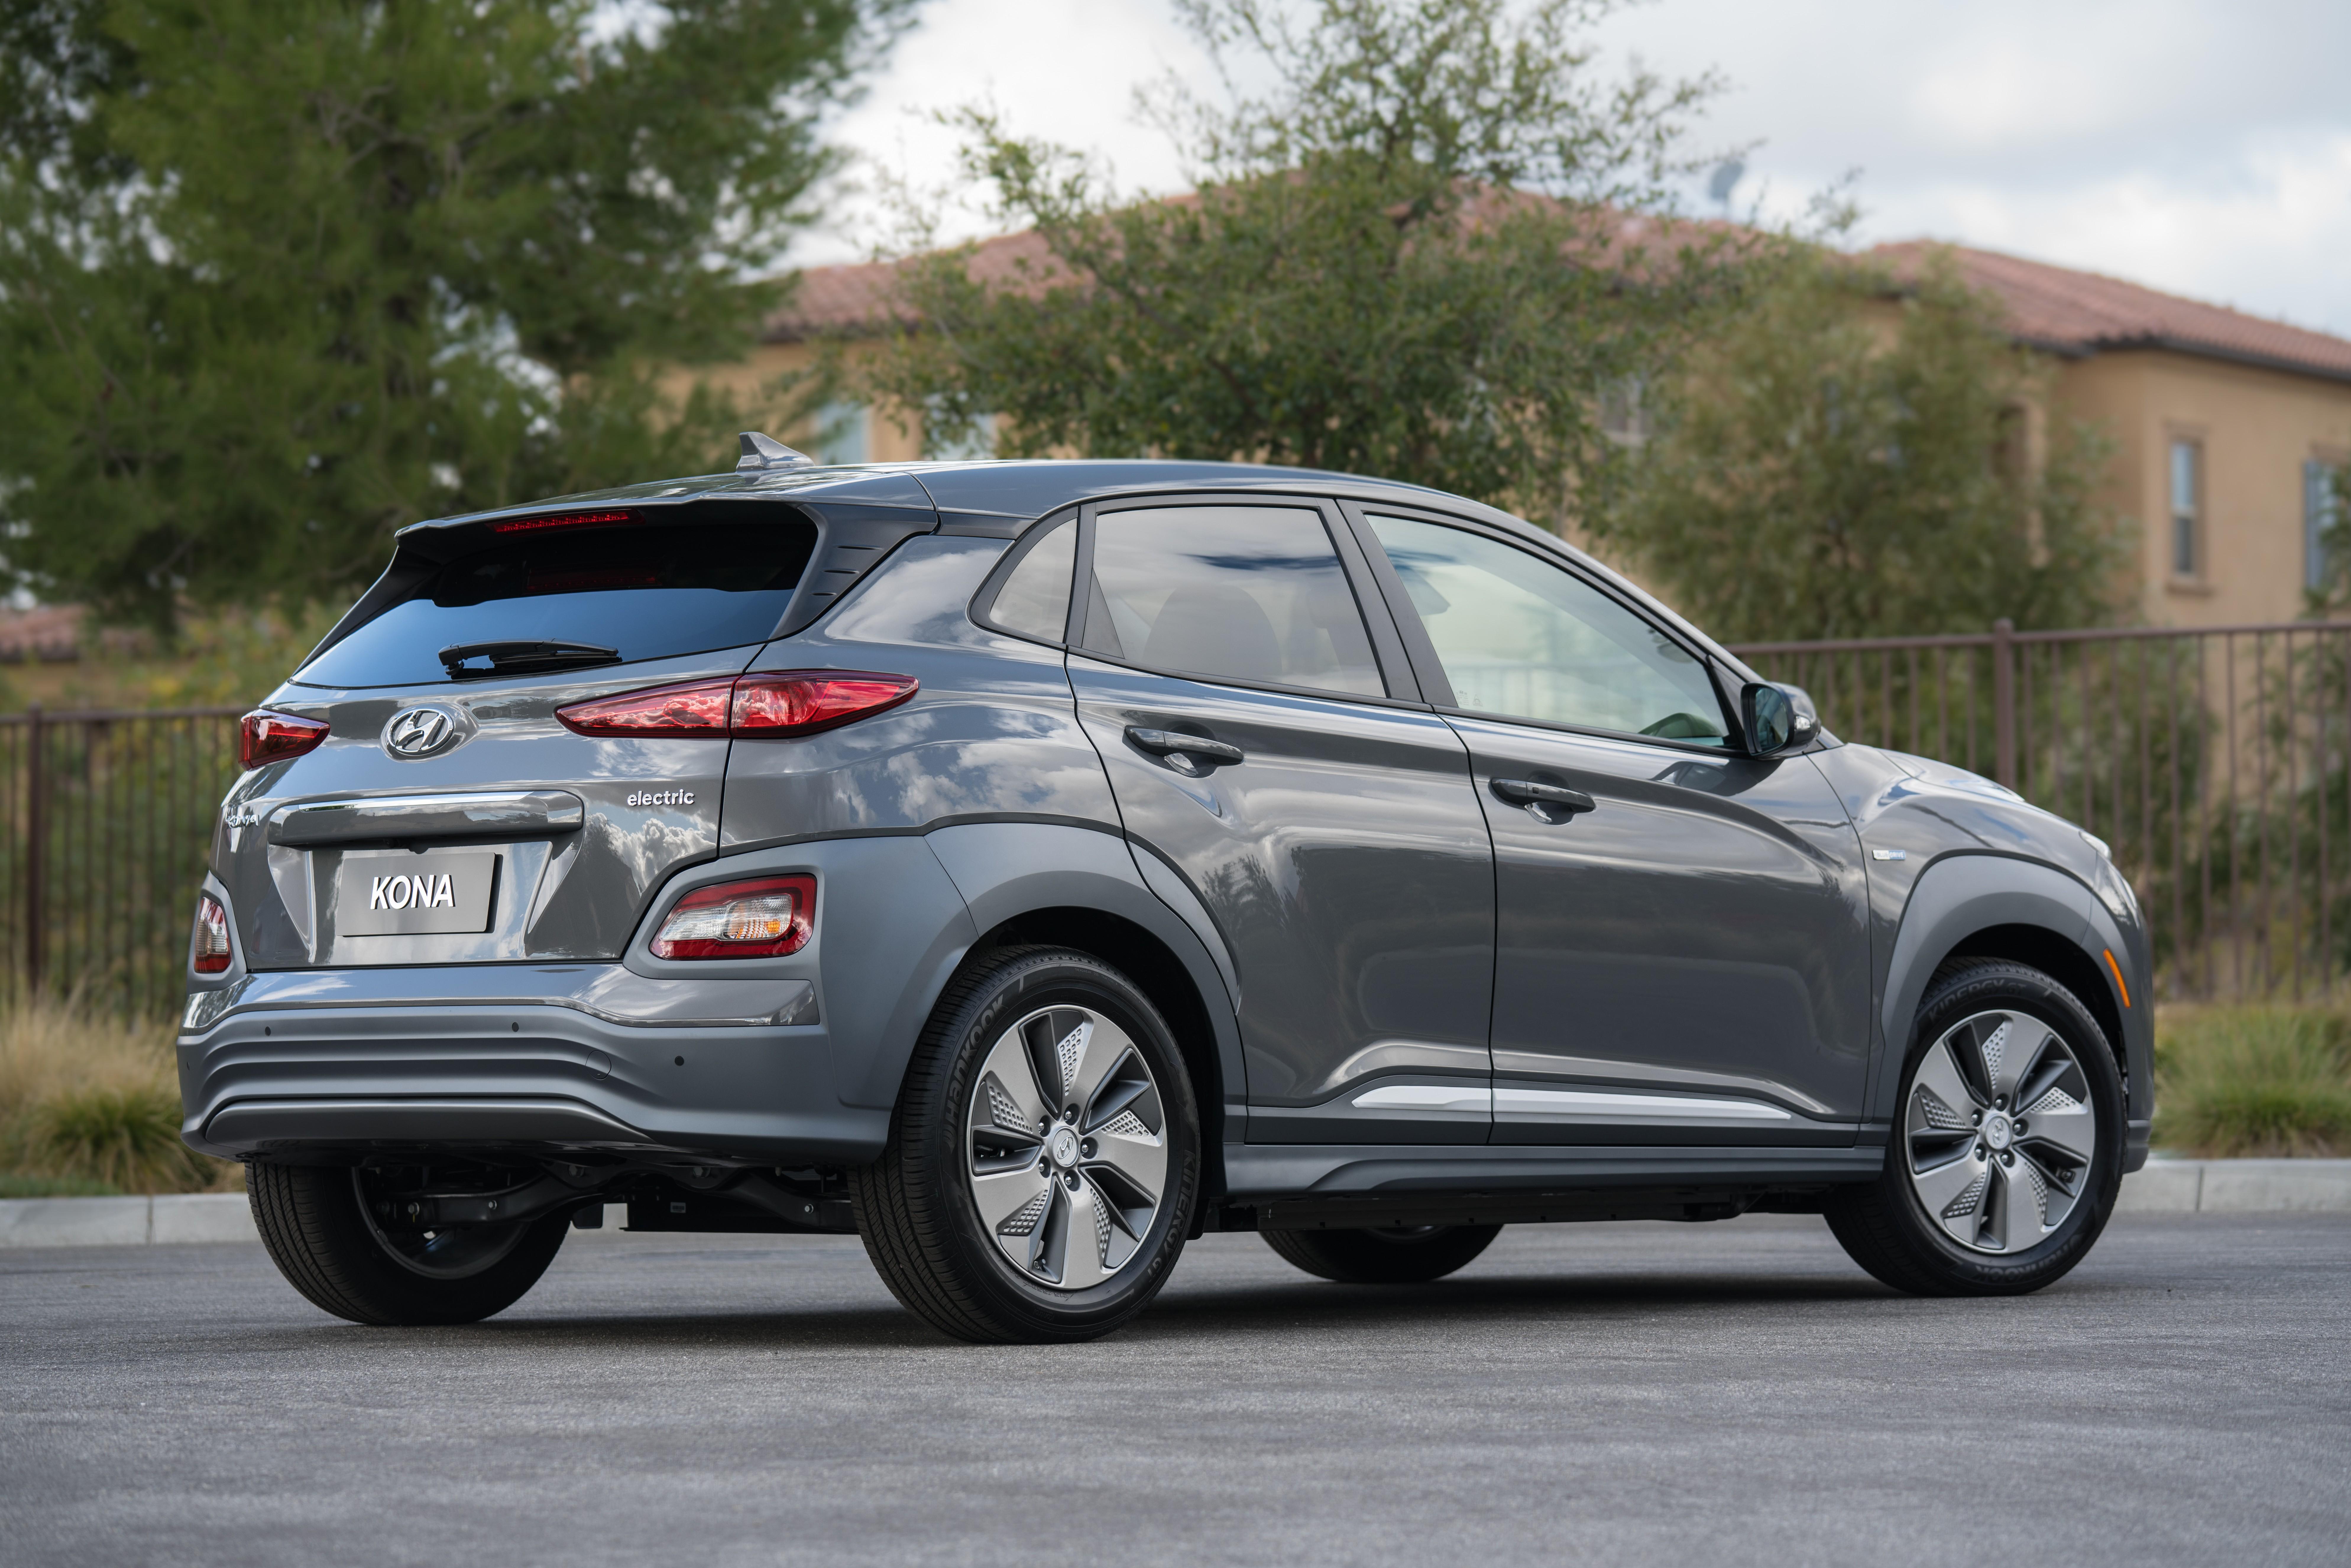 Hyundai Kona Ev Gets Norwegian Price Specs As Company Plans To Make